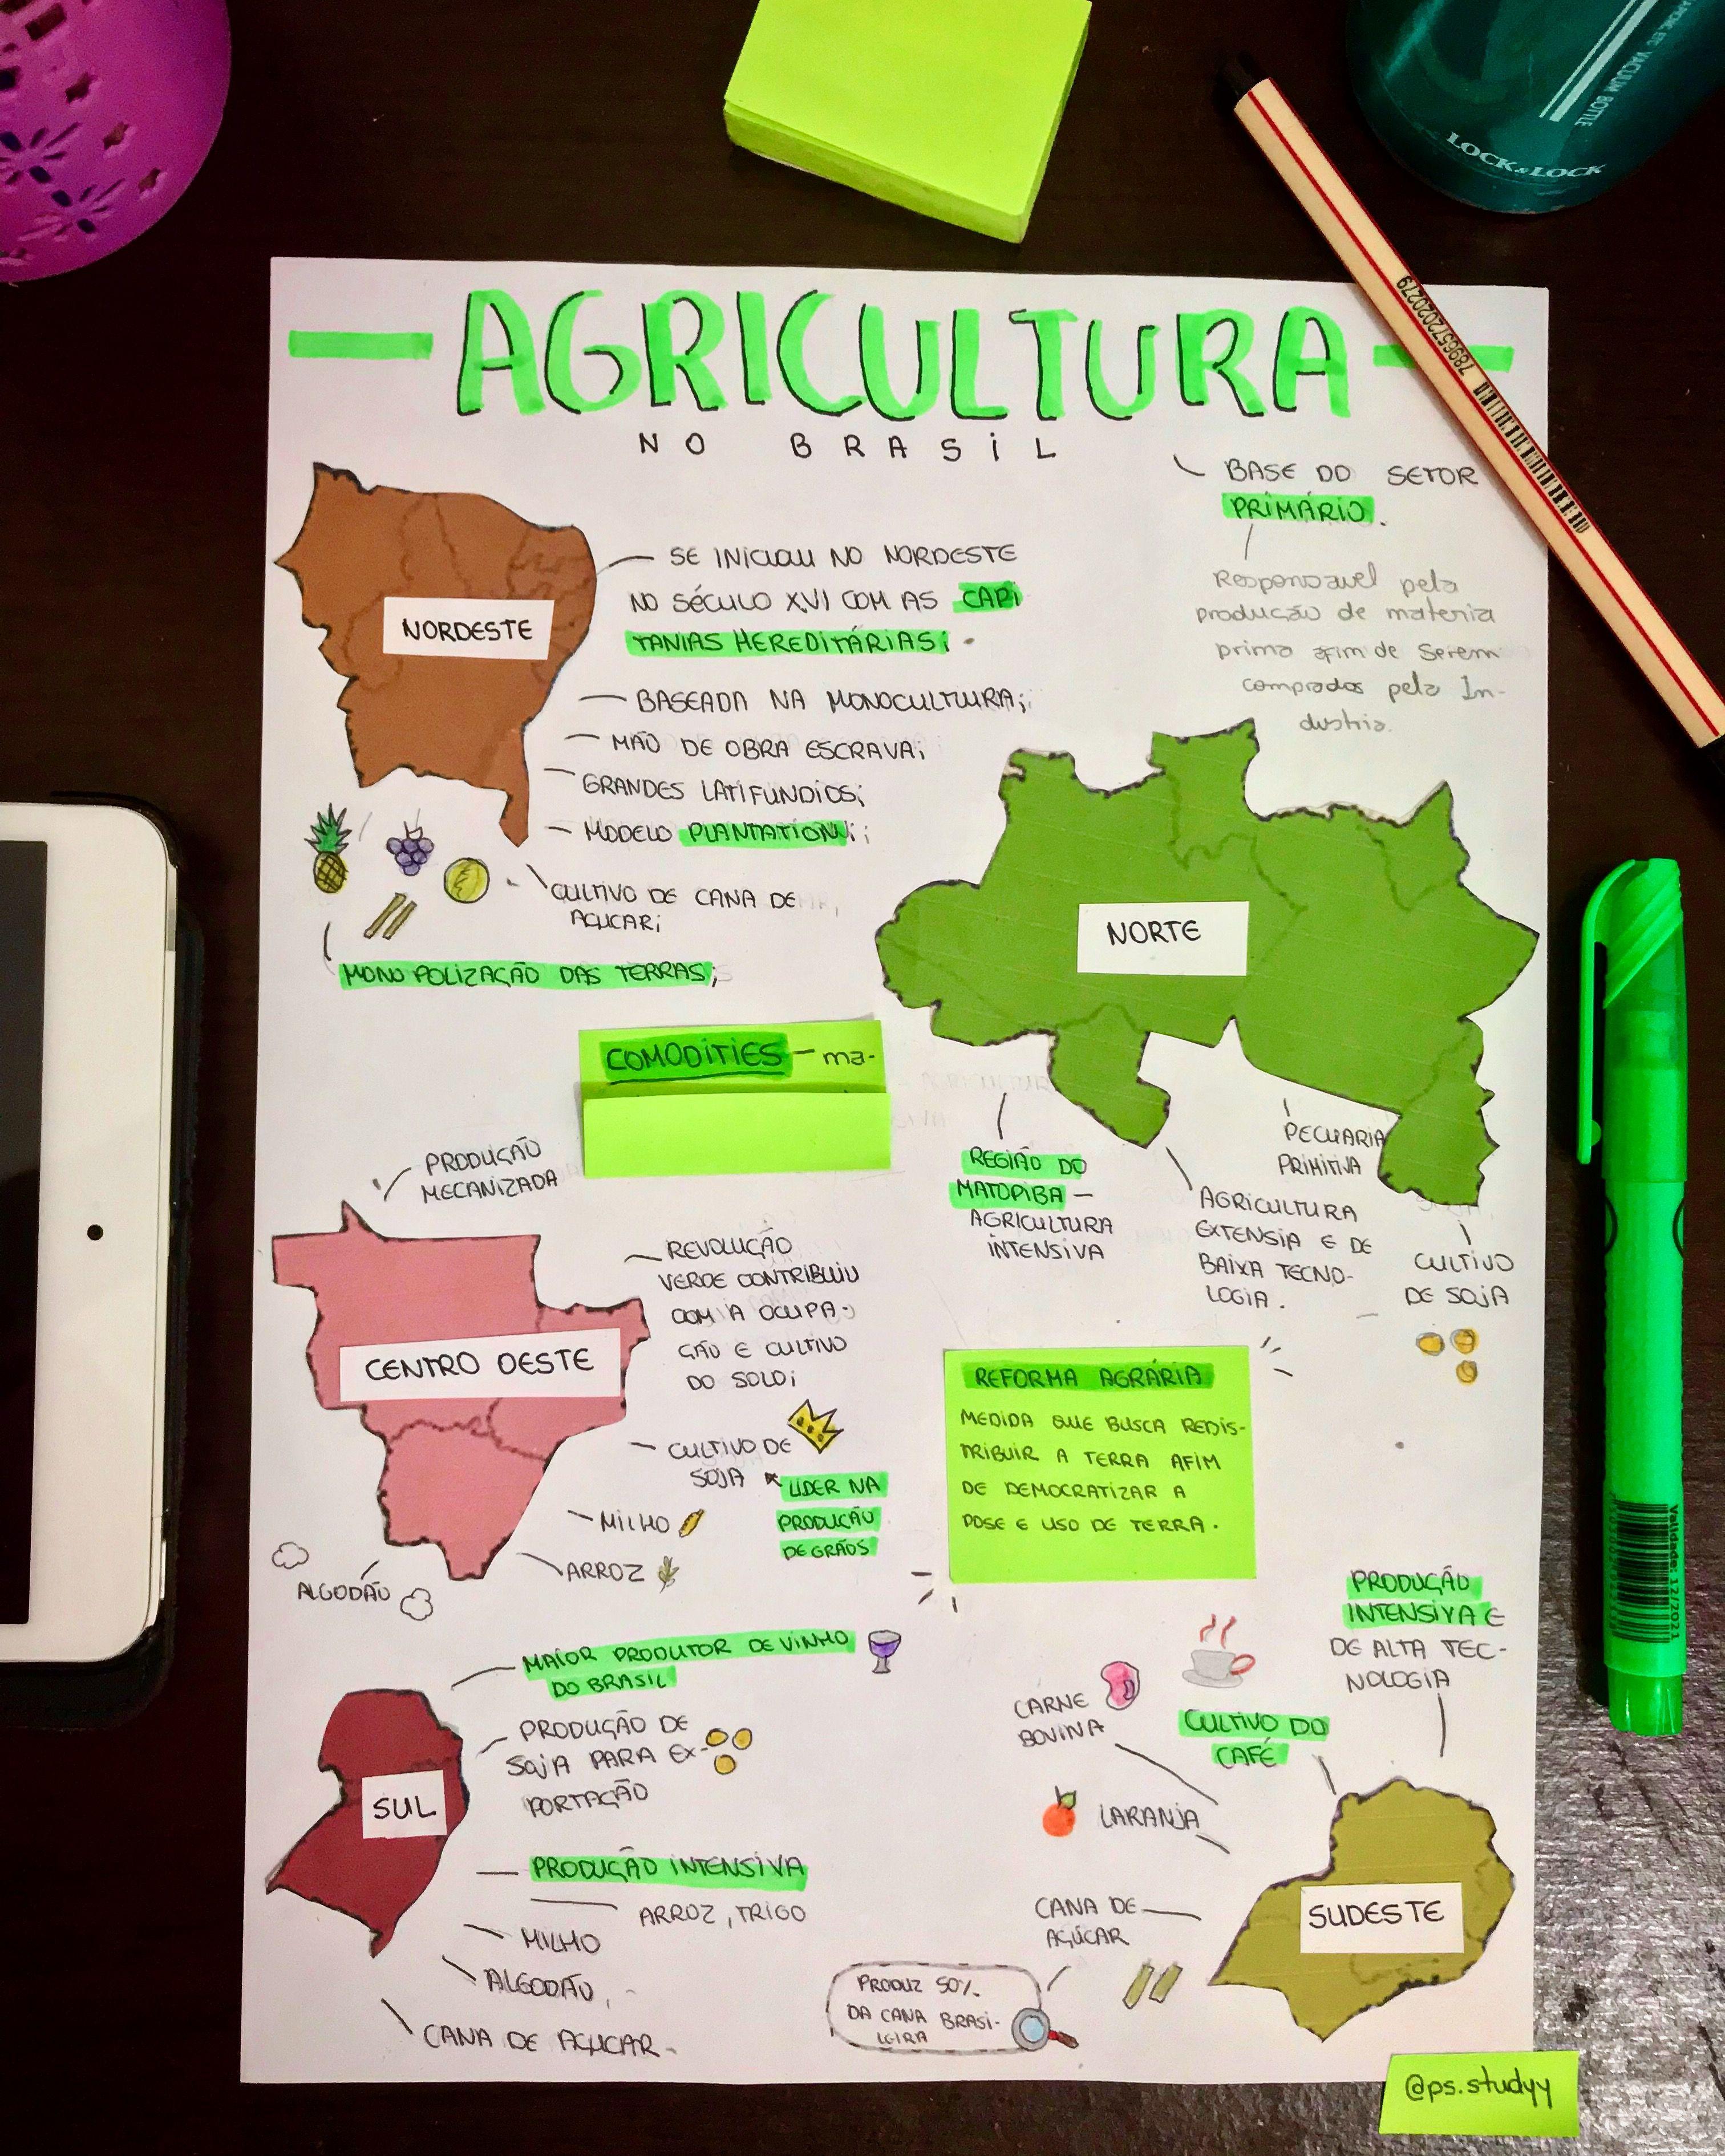 Agricultura no Brasil Mapa mental Agricultura no brasil